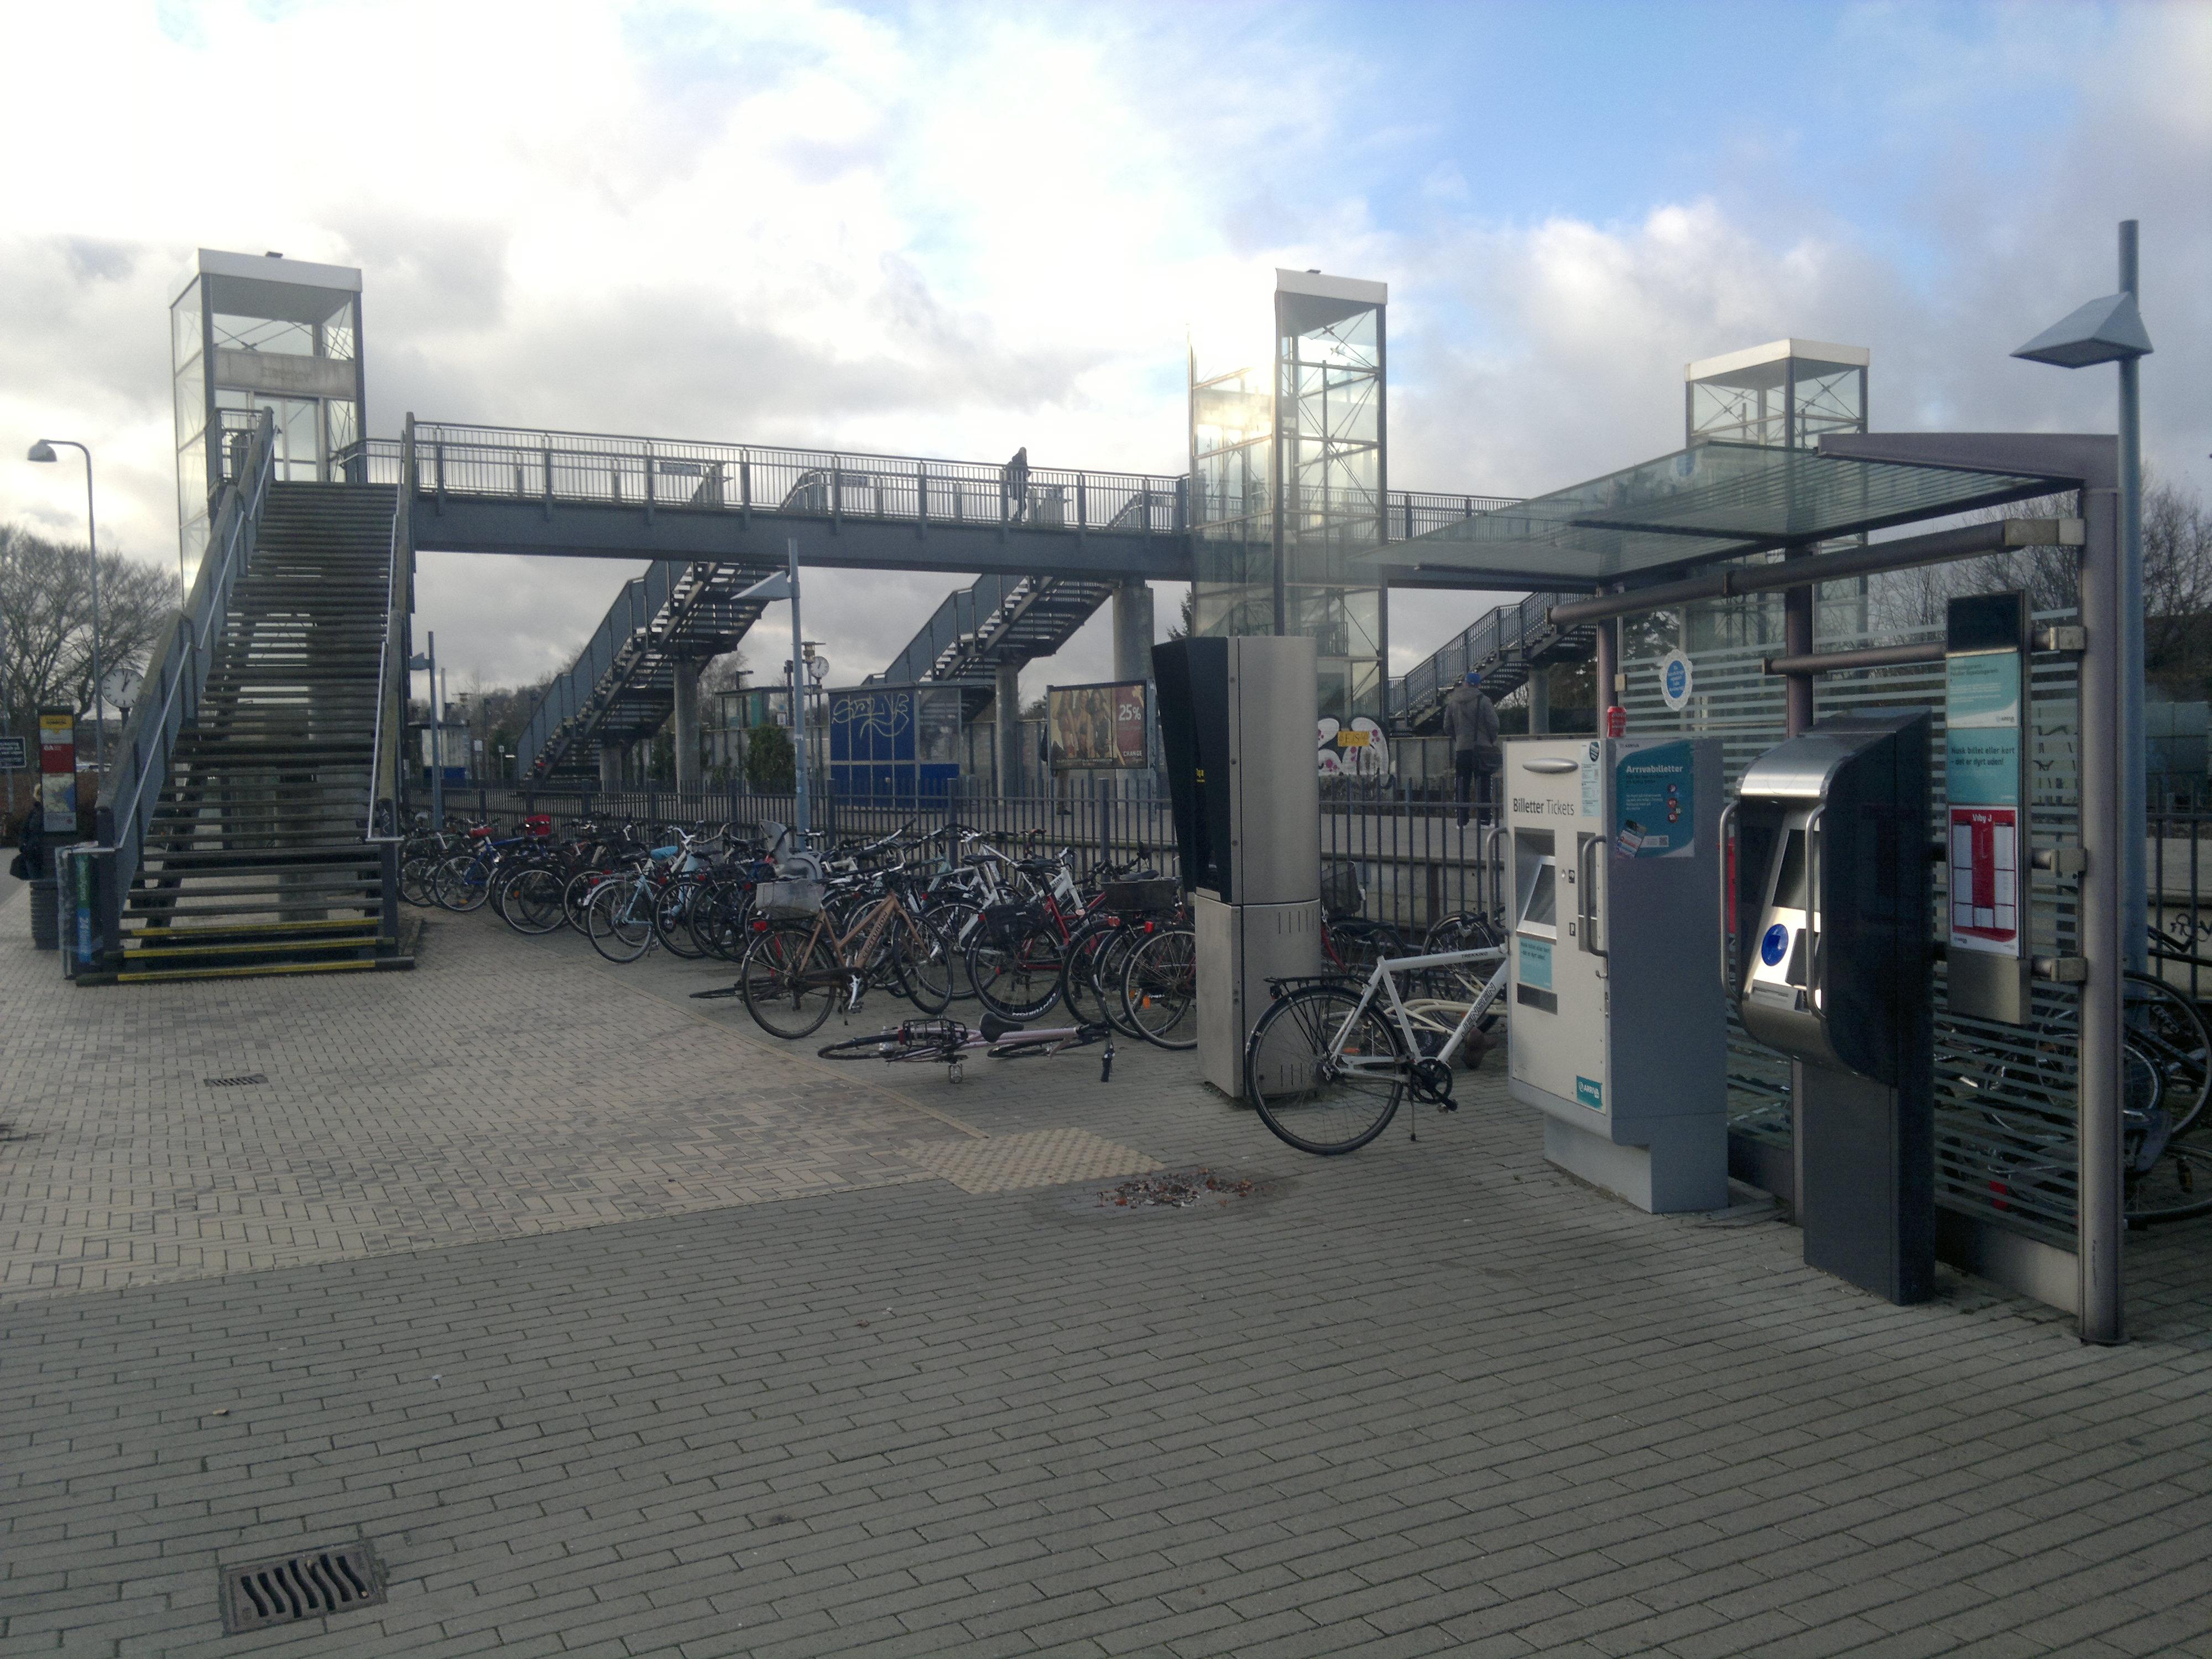 File Viby J Station Aarhus 7 Jpg Wikimedia Commons